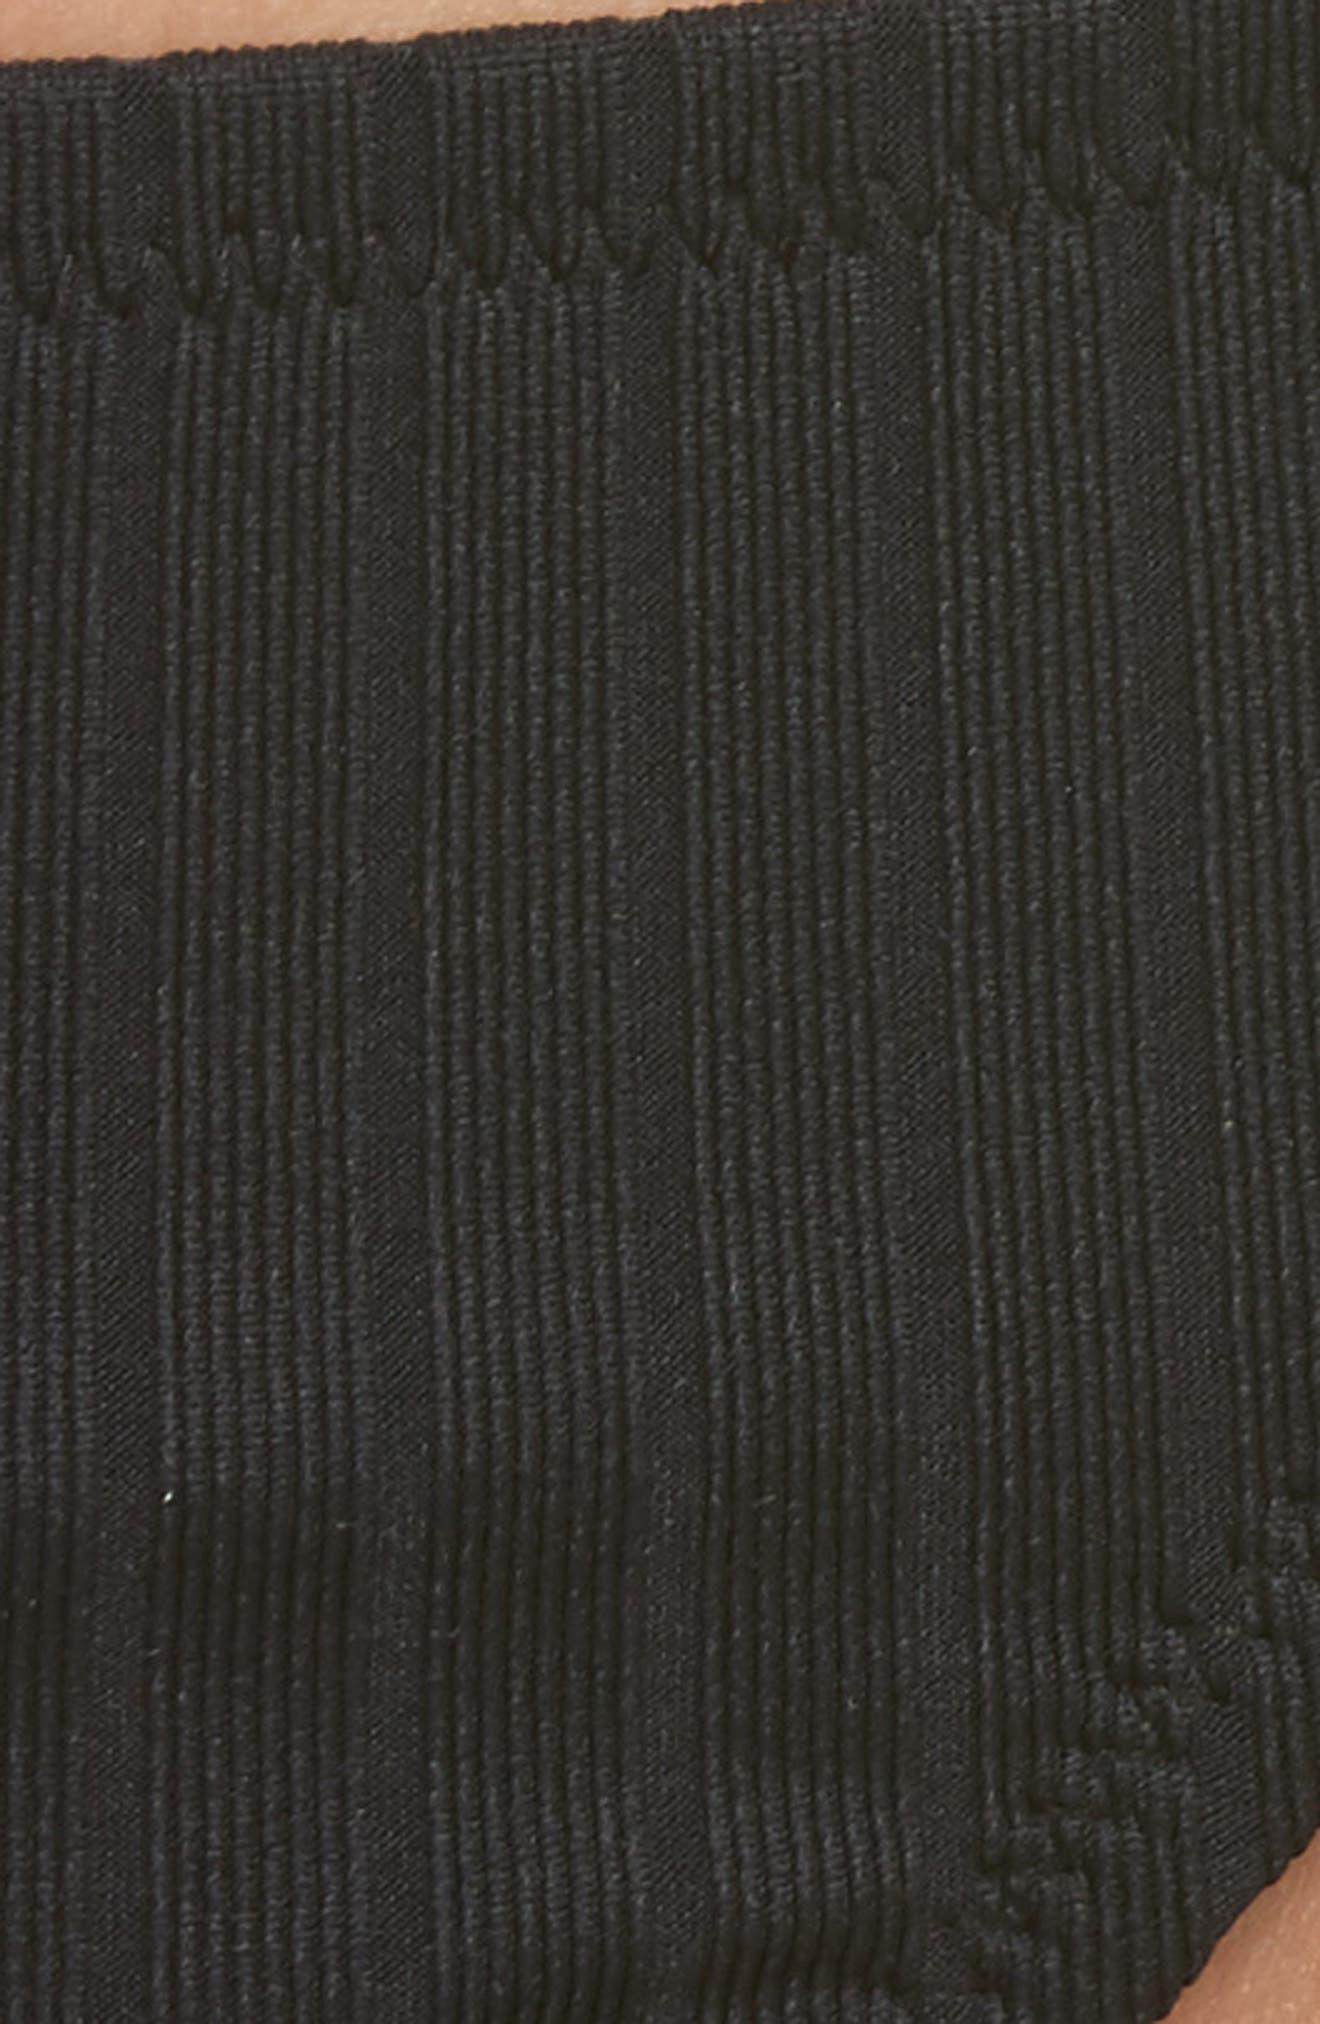 Effie Bikini Bottoms,                             Alternate thumbnail 8, color,                             Black Rib